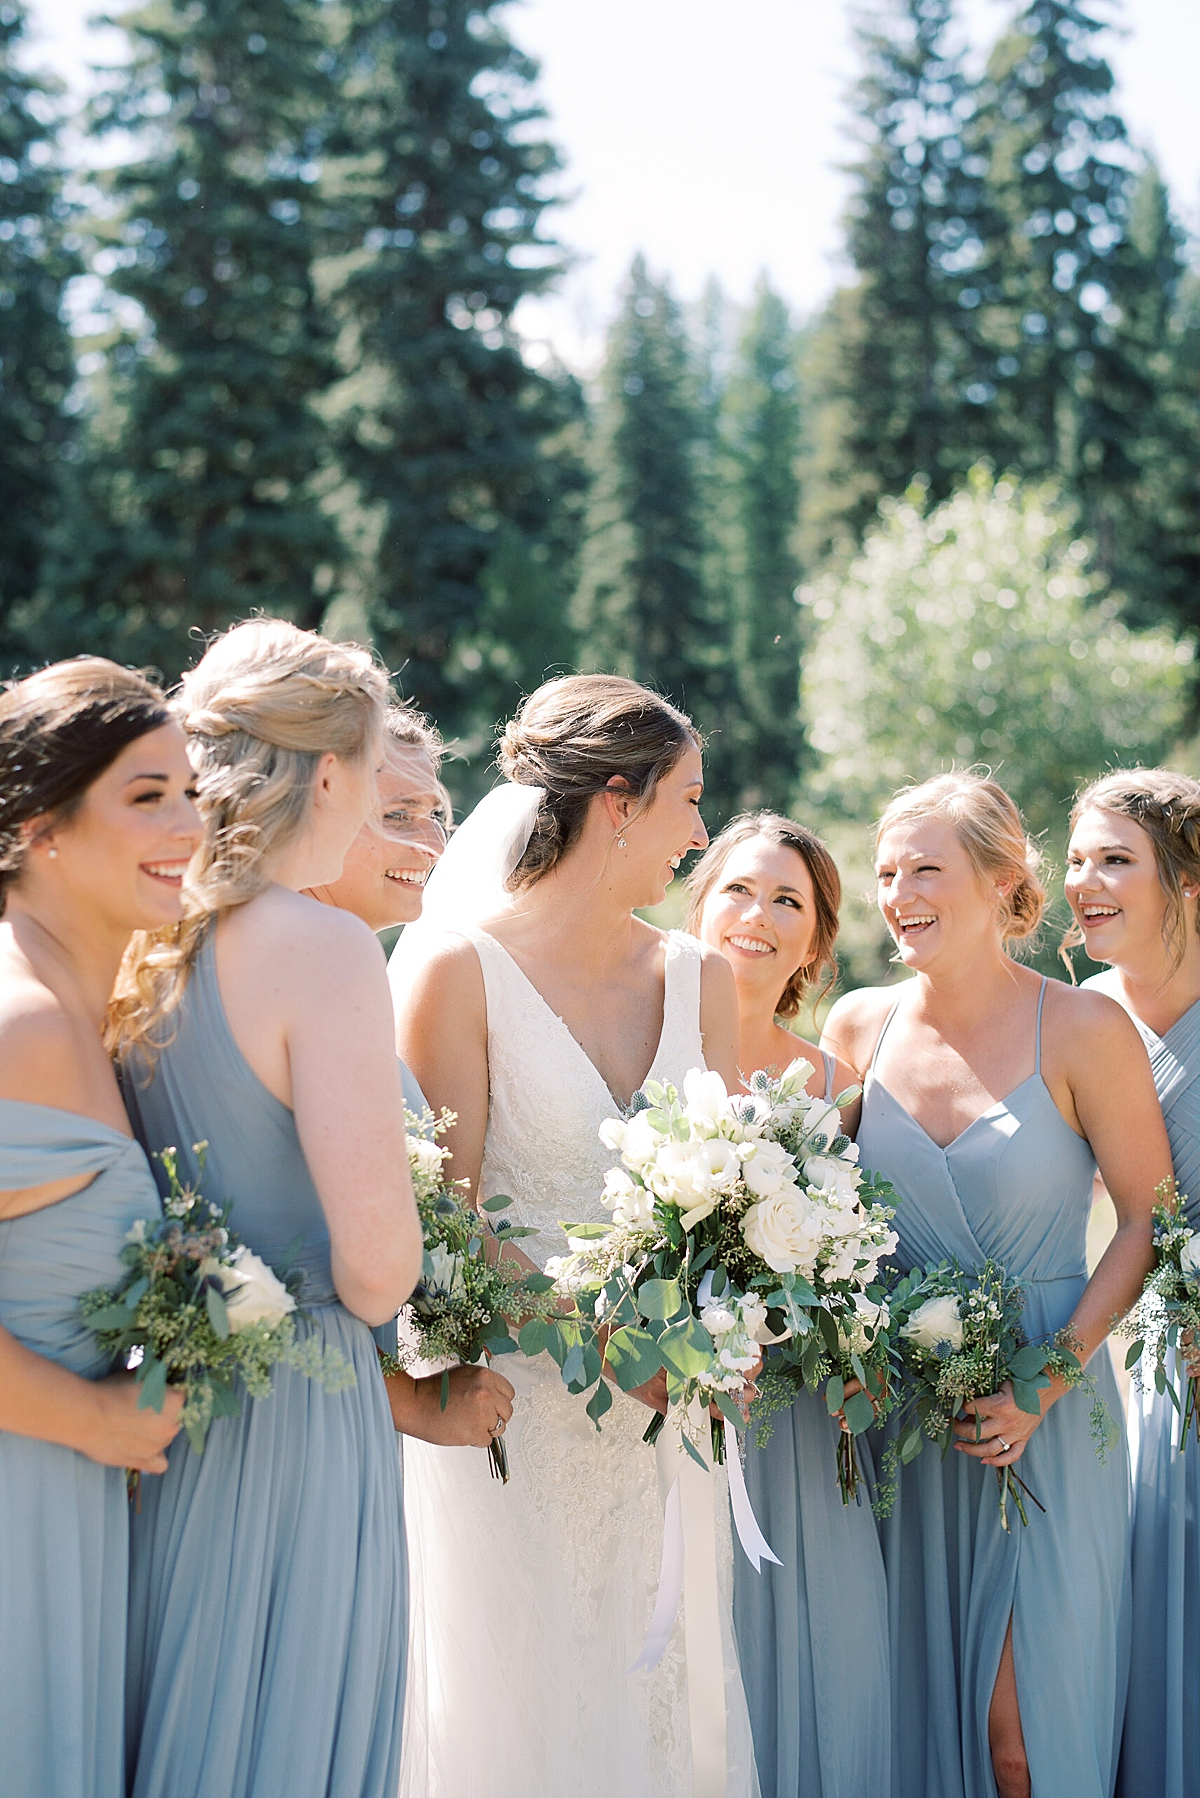 IdahosBestWeddingPhotographer_0280.jpg